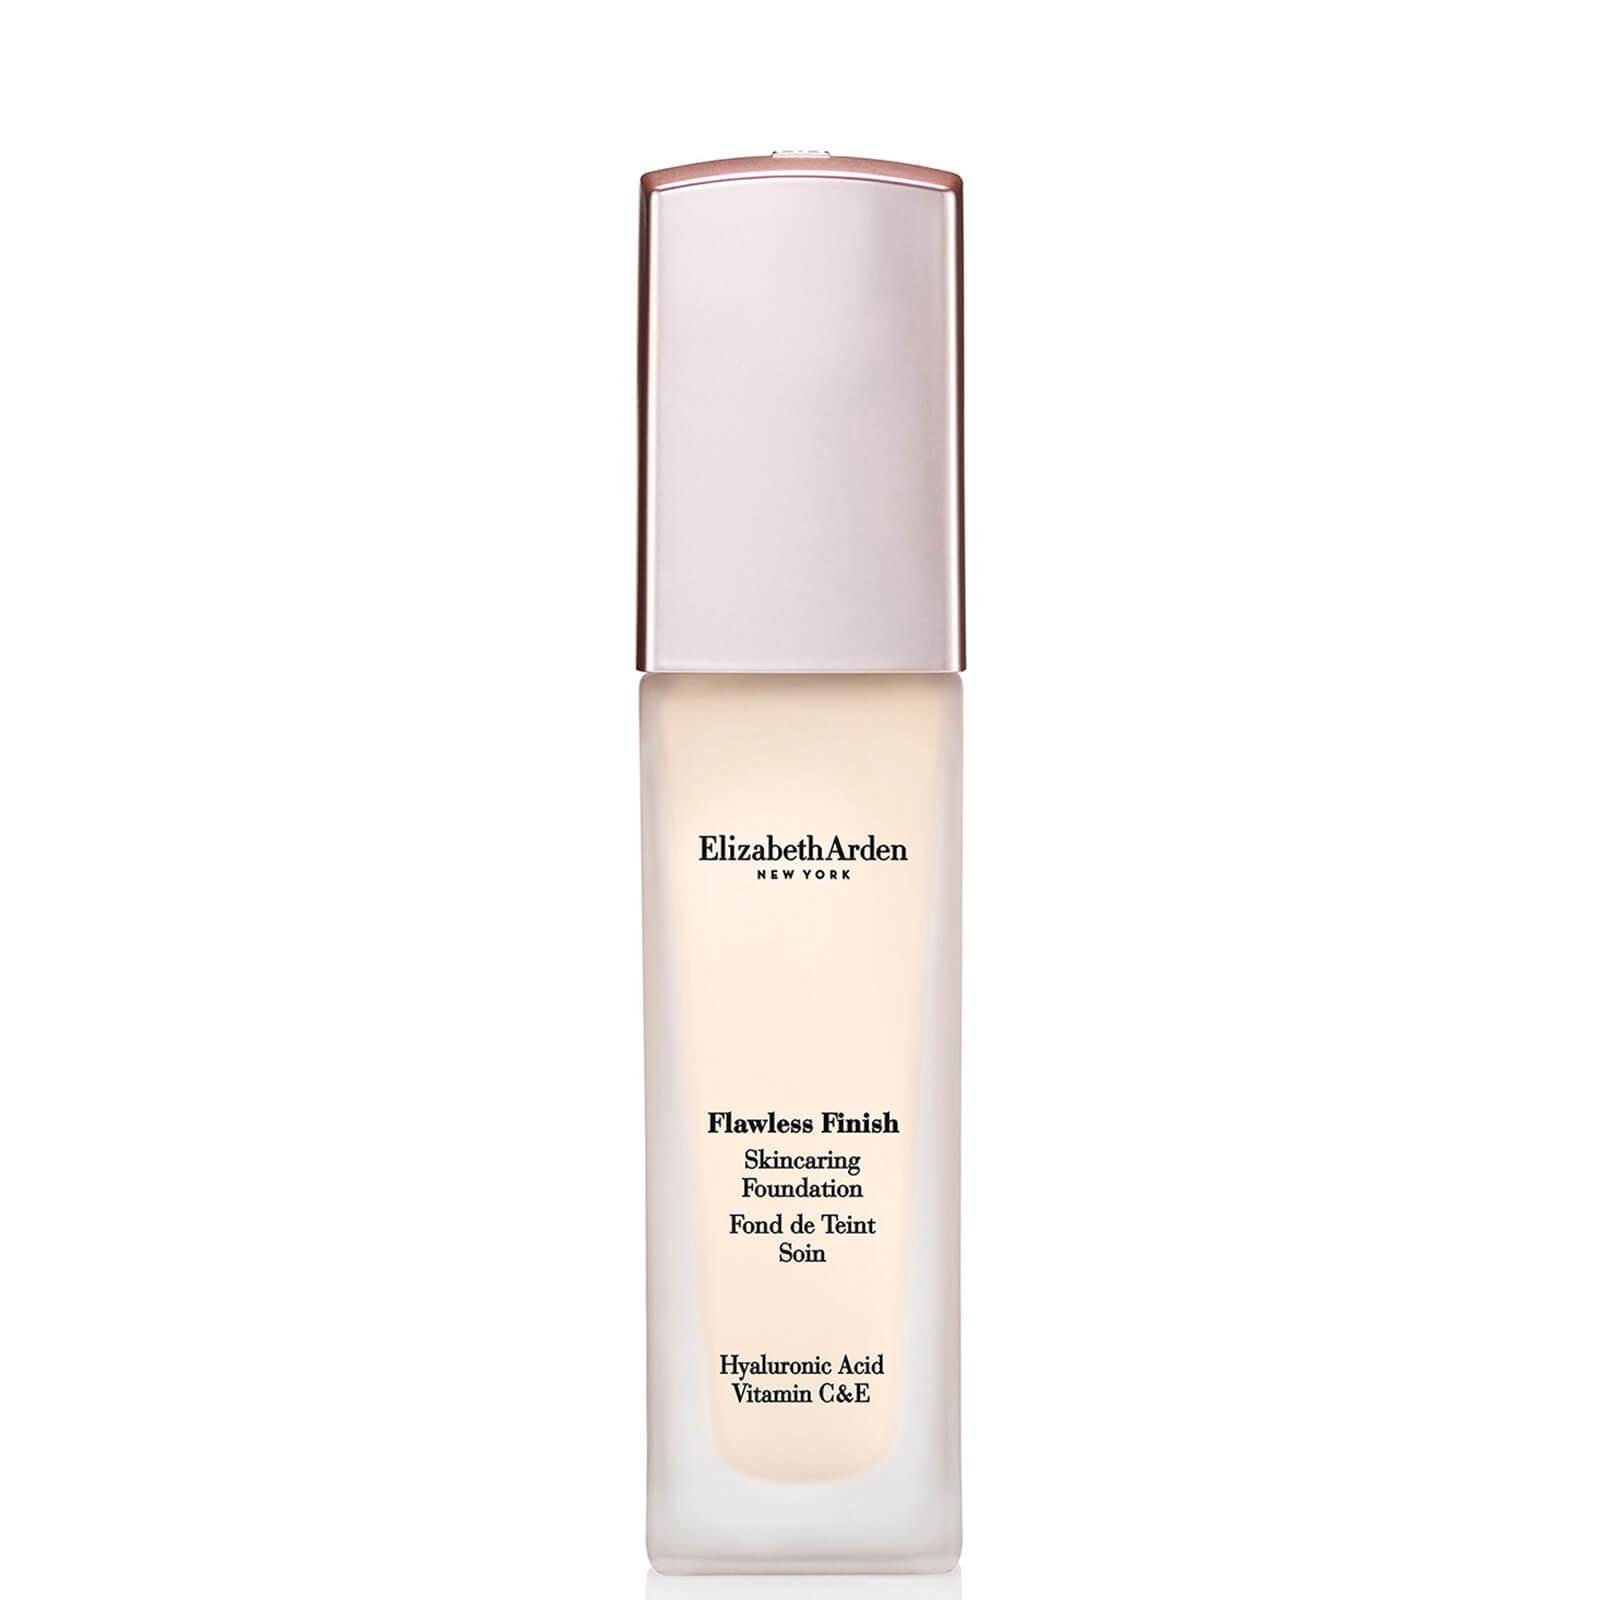 Elizabeth Arden Flawless Finish Skincaring Foundation 30ml (Various Shades) - 100C